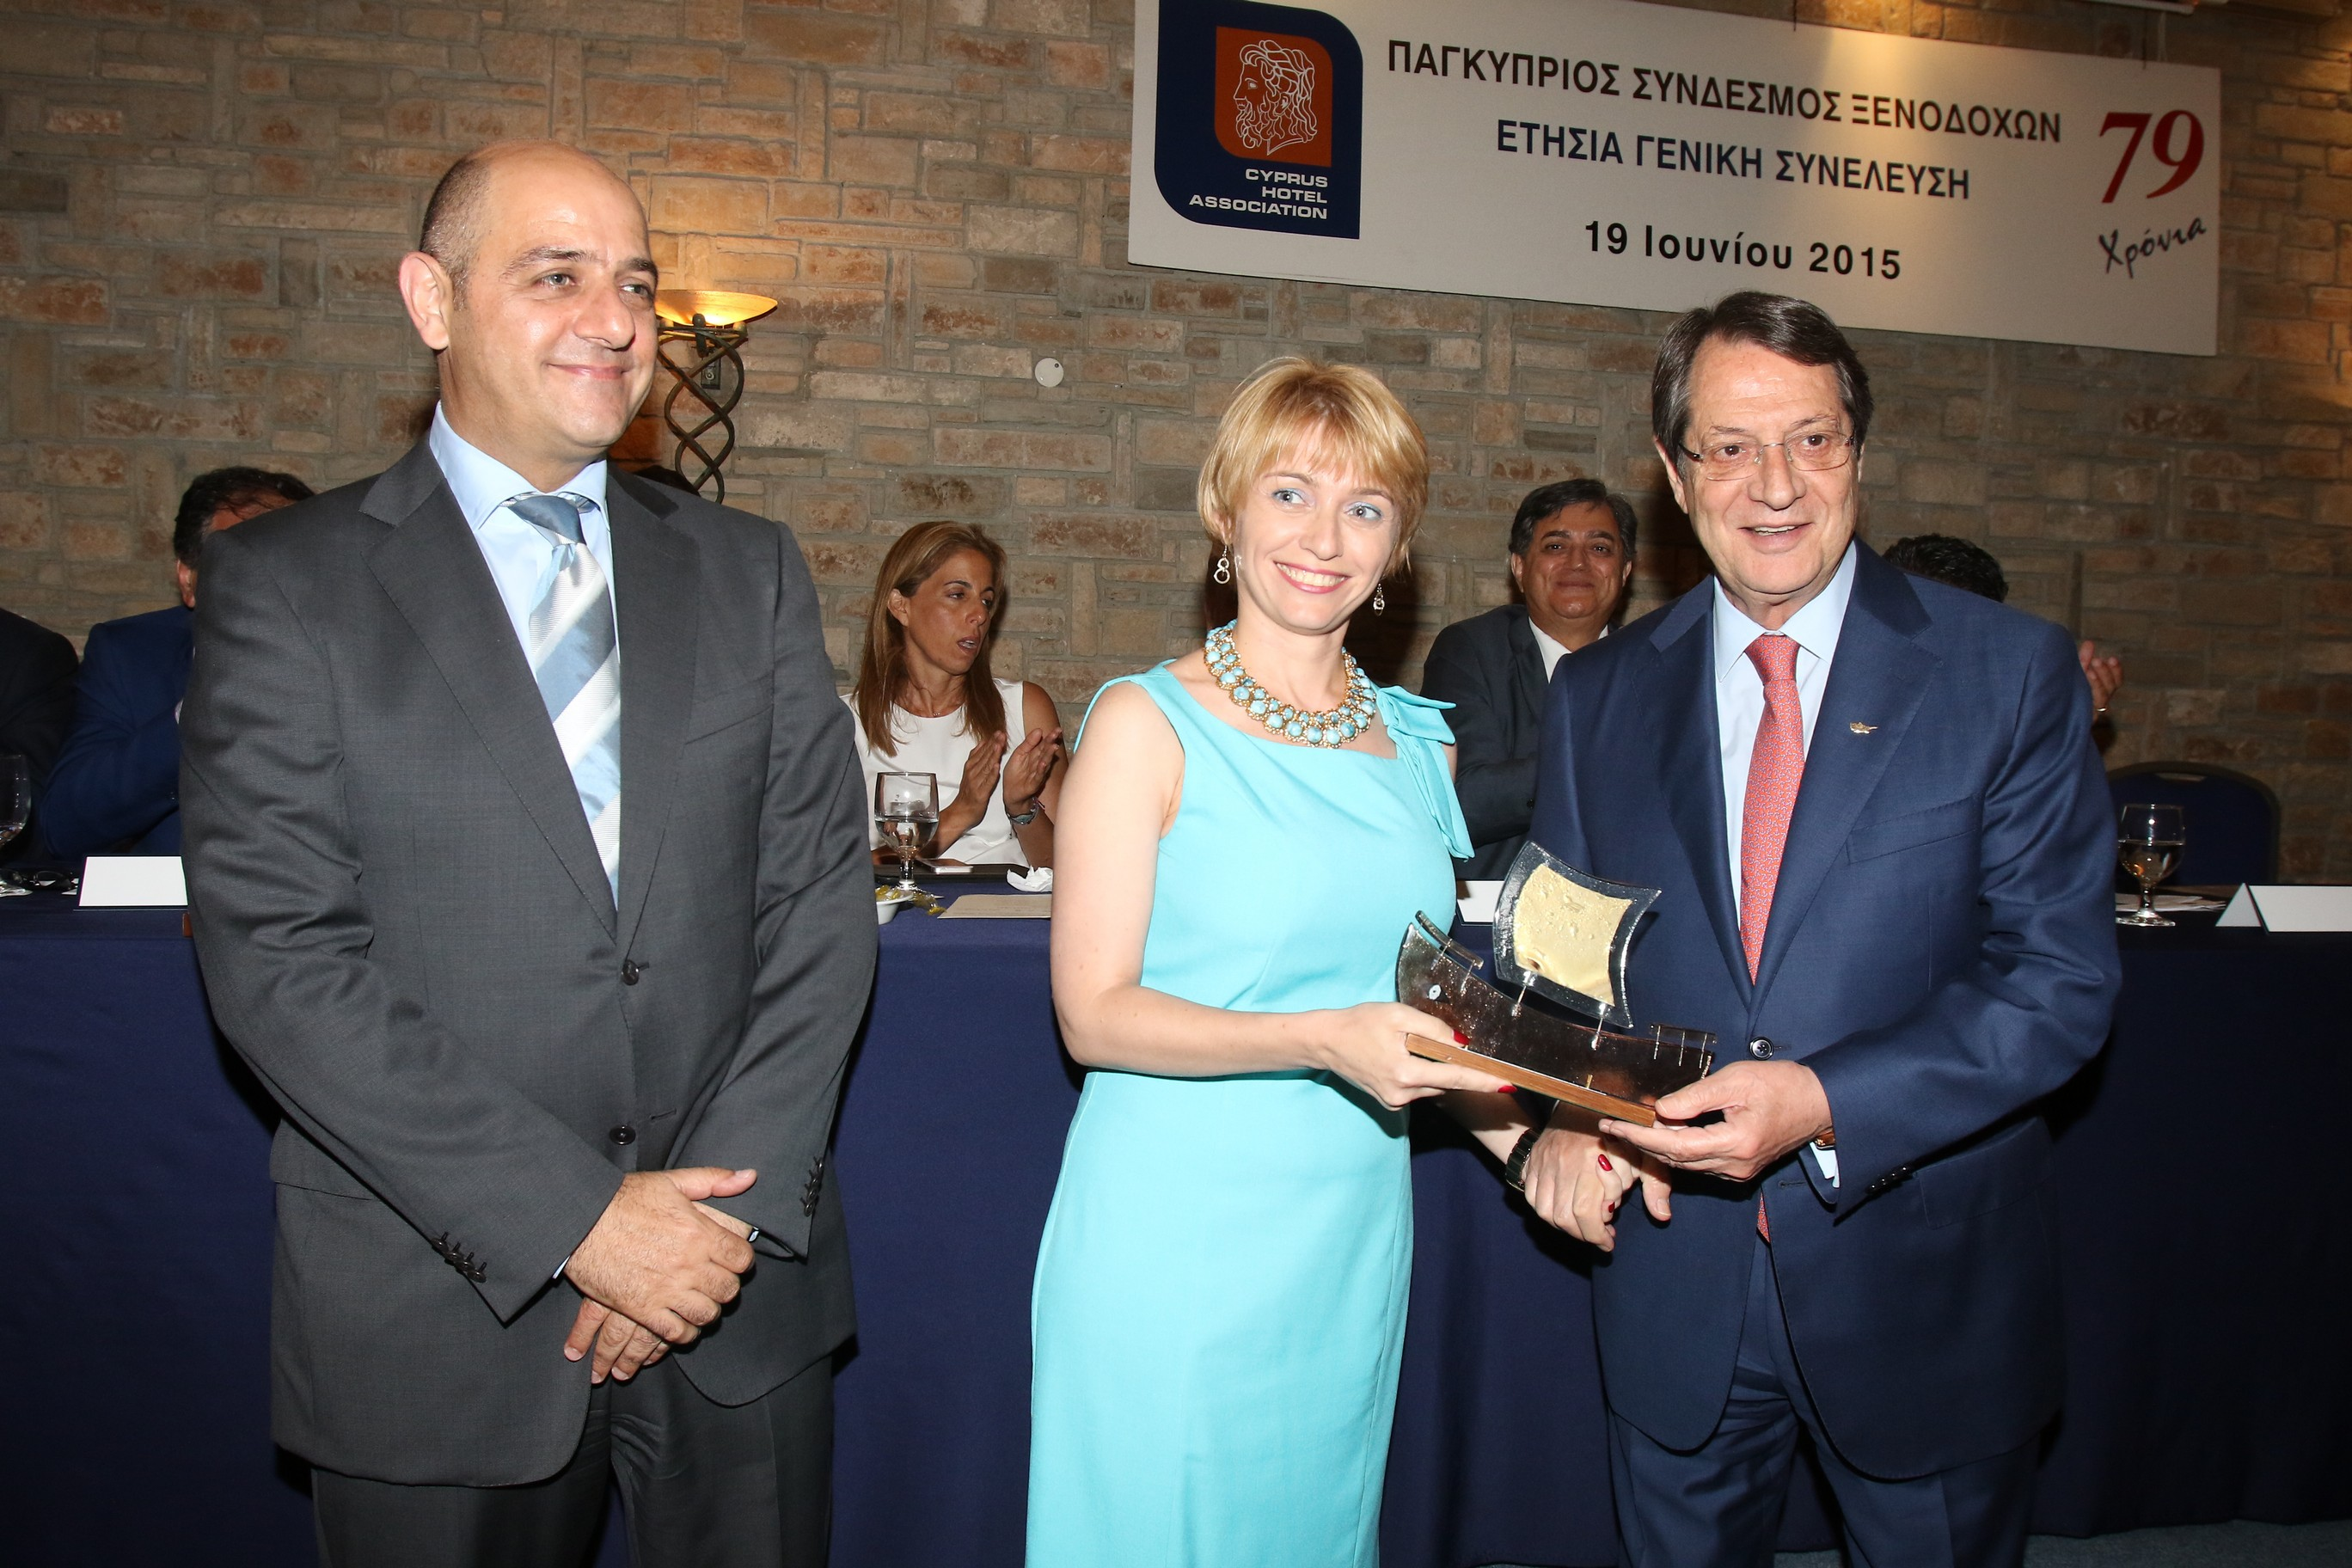 """Вестнику Кипра"" - 23! - Вестник Кипра"